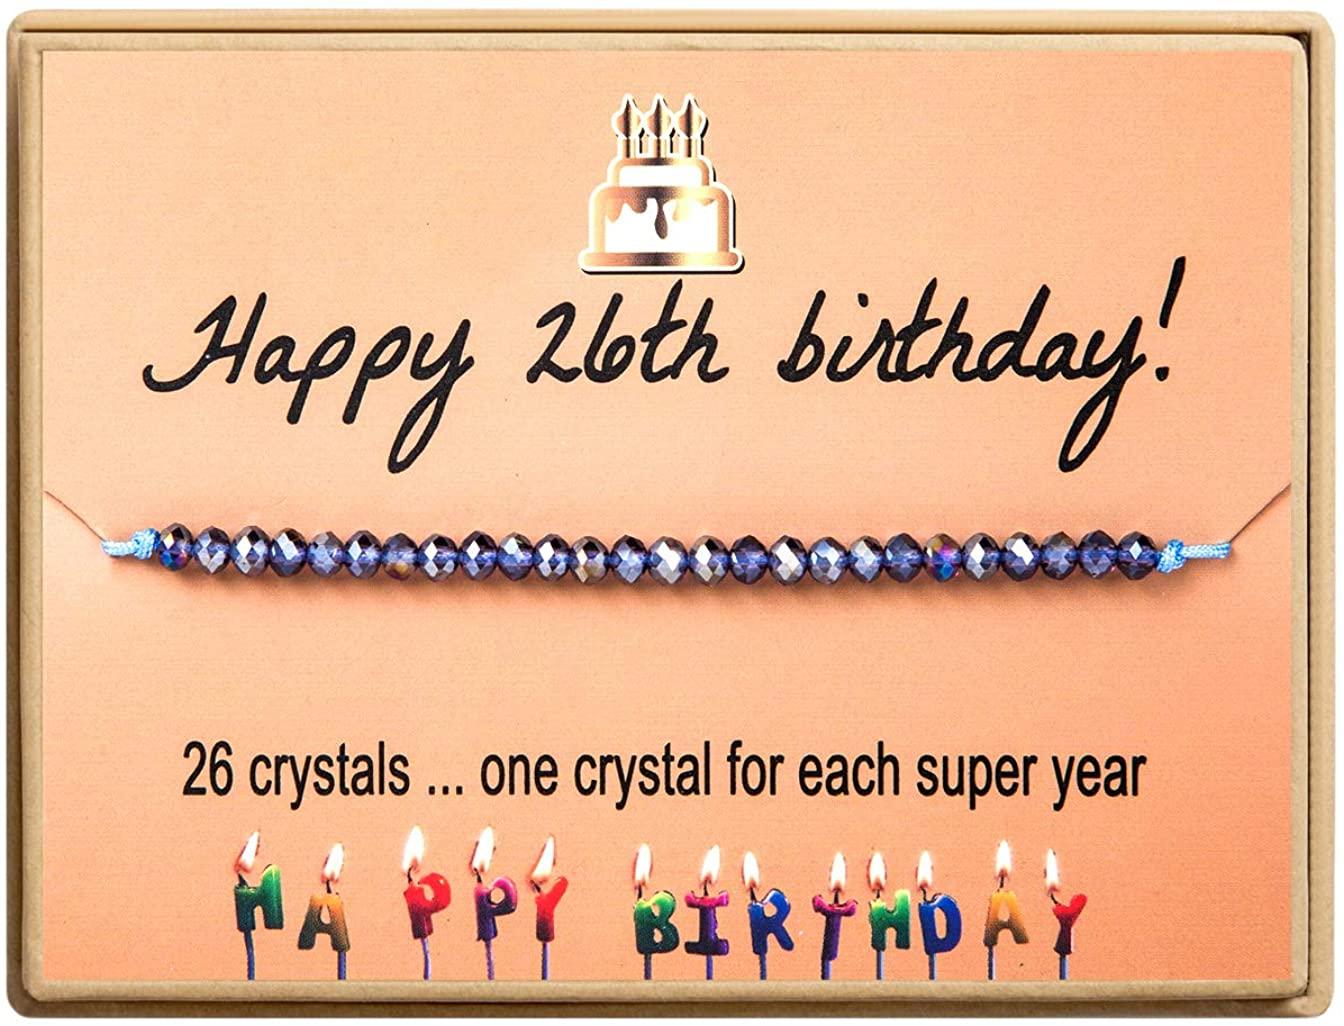 KGBNCIE Happy Birthday Gifts Bracelet Crystal Beads Bracelet Gift for Women Girls 11st 12th 13th 14th 15th 16th 17th 18th 19th 20th 21th 25th 30th